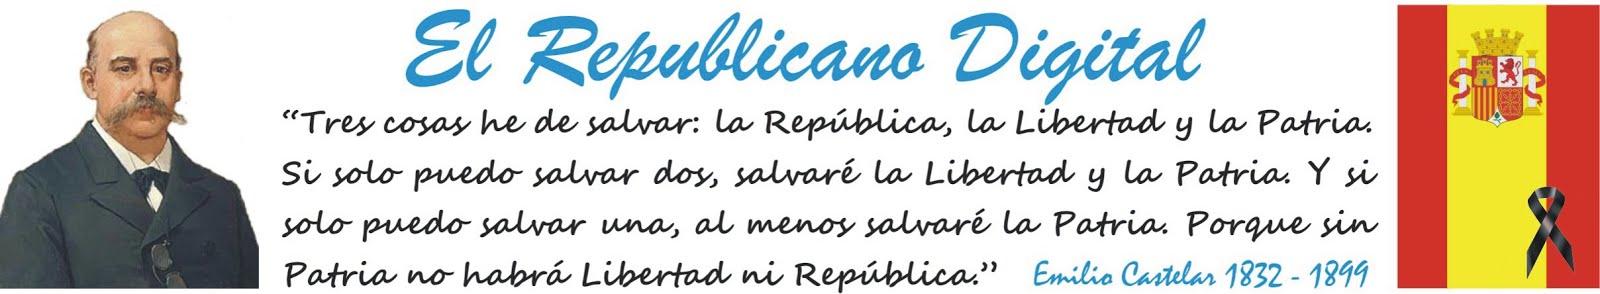 EL REPUBLICANO DIGITAL